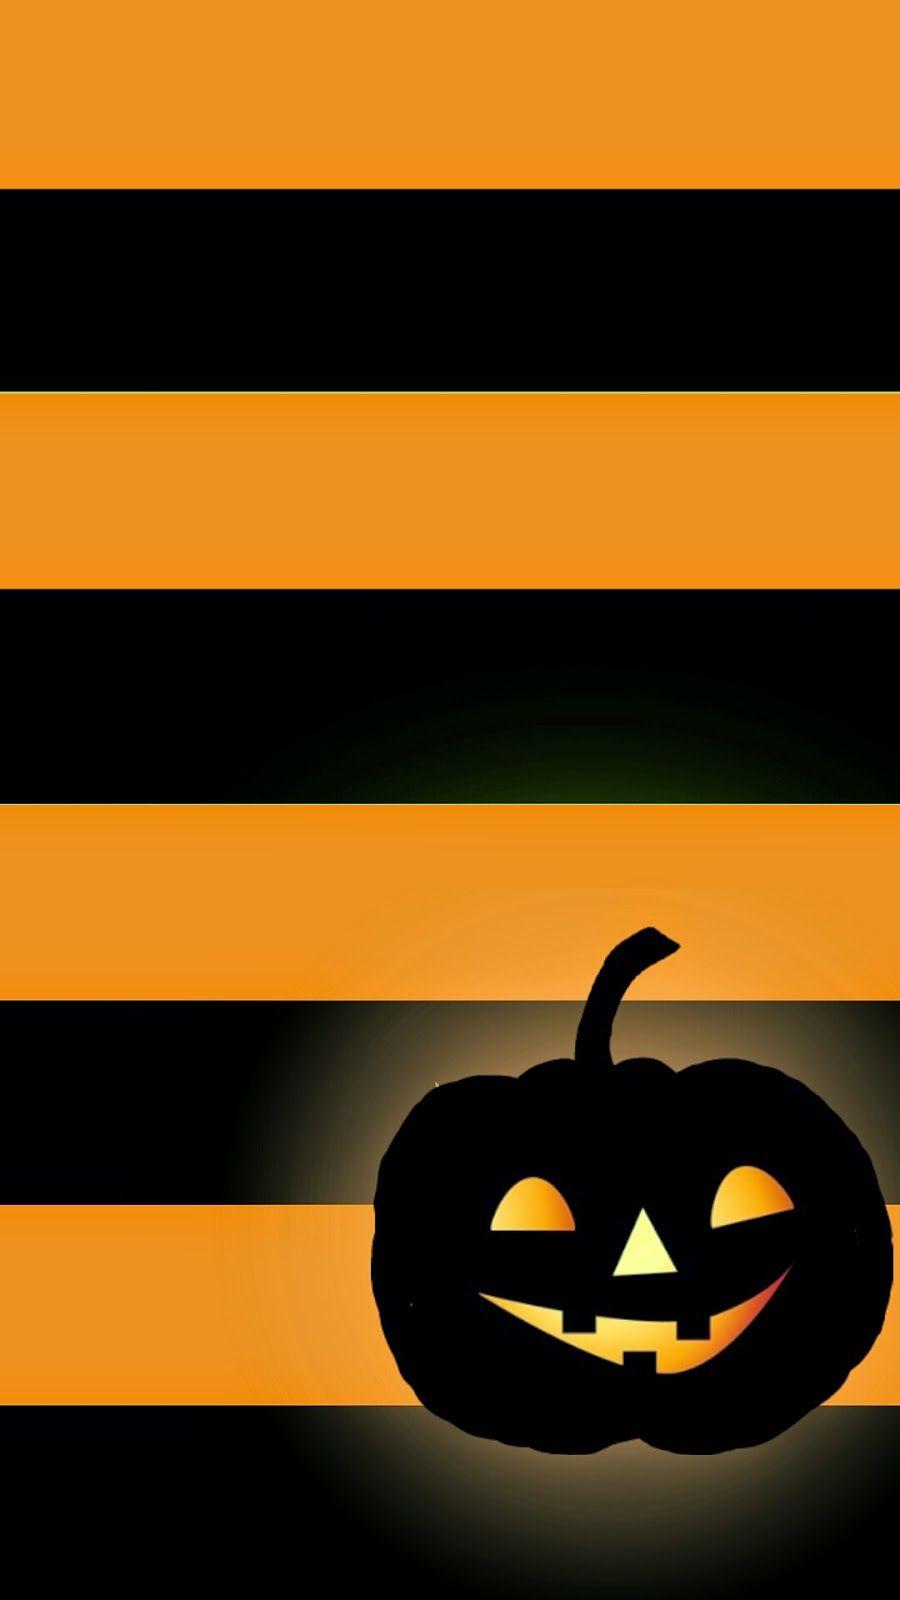 Most Inspiring Wallpaper Halloween Iphone - 625d855a52a7c2a50ddfb57d0e64eeb7  Pic_83905.jpg